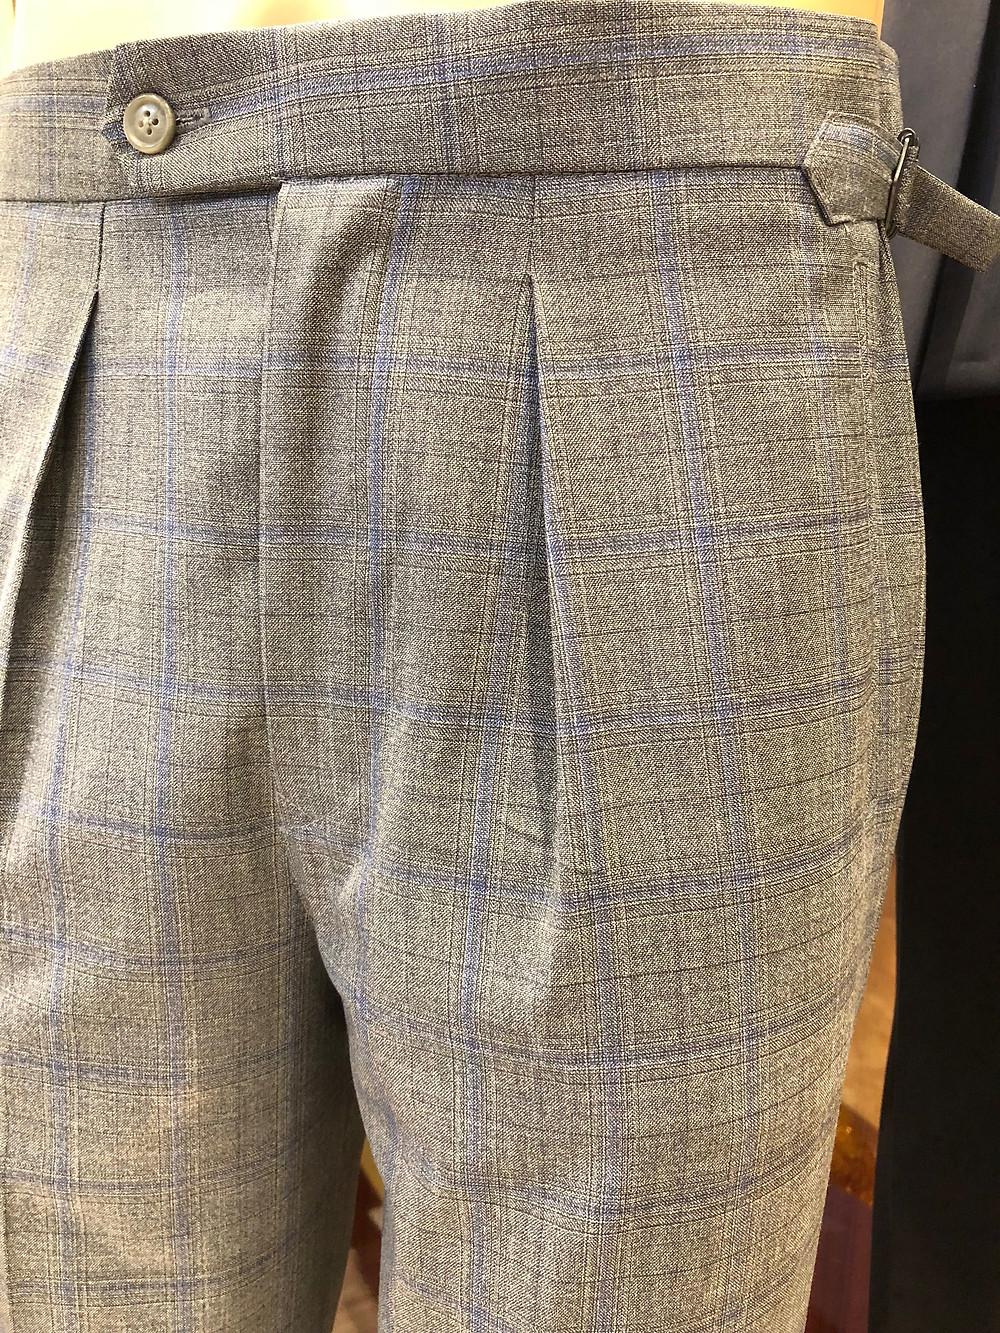 Meiko Tailor Pants